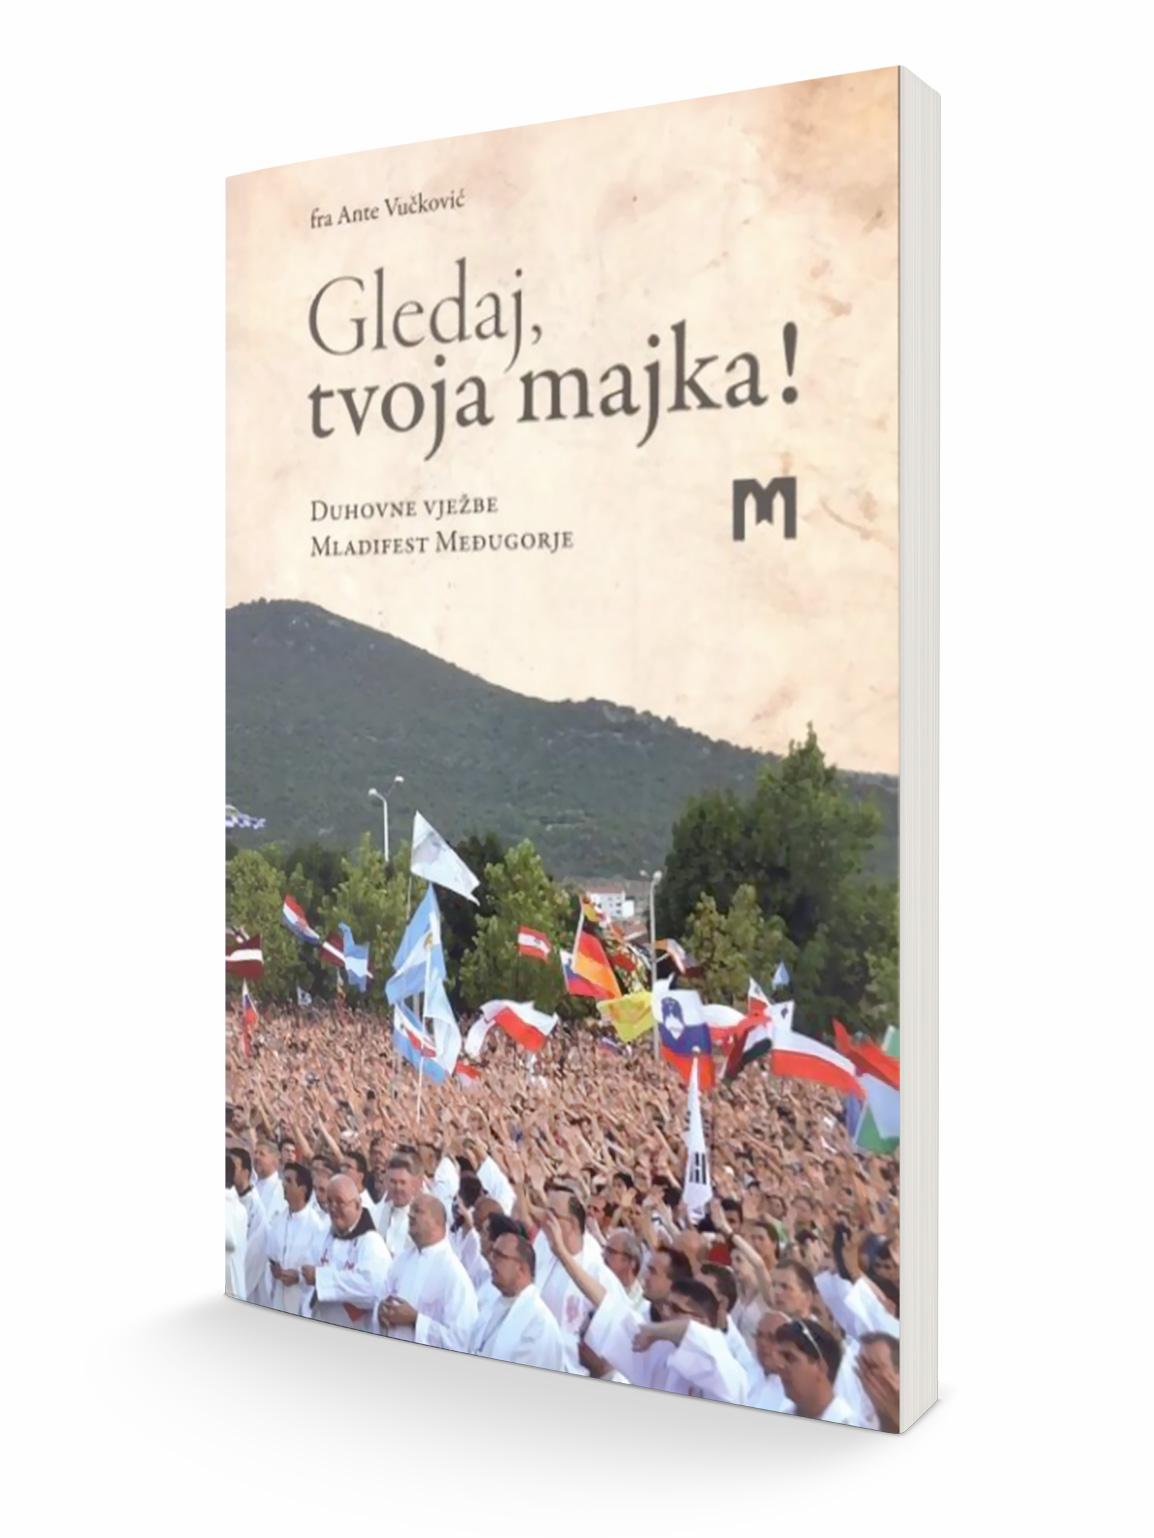 GLEDAJ, TVOJA MAJKA! - fra Ante Vučković